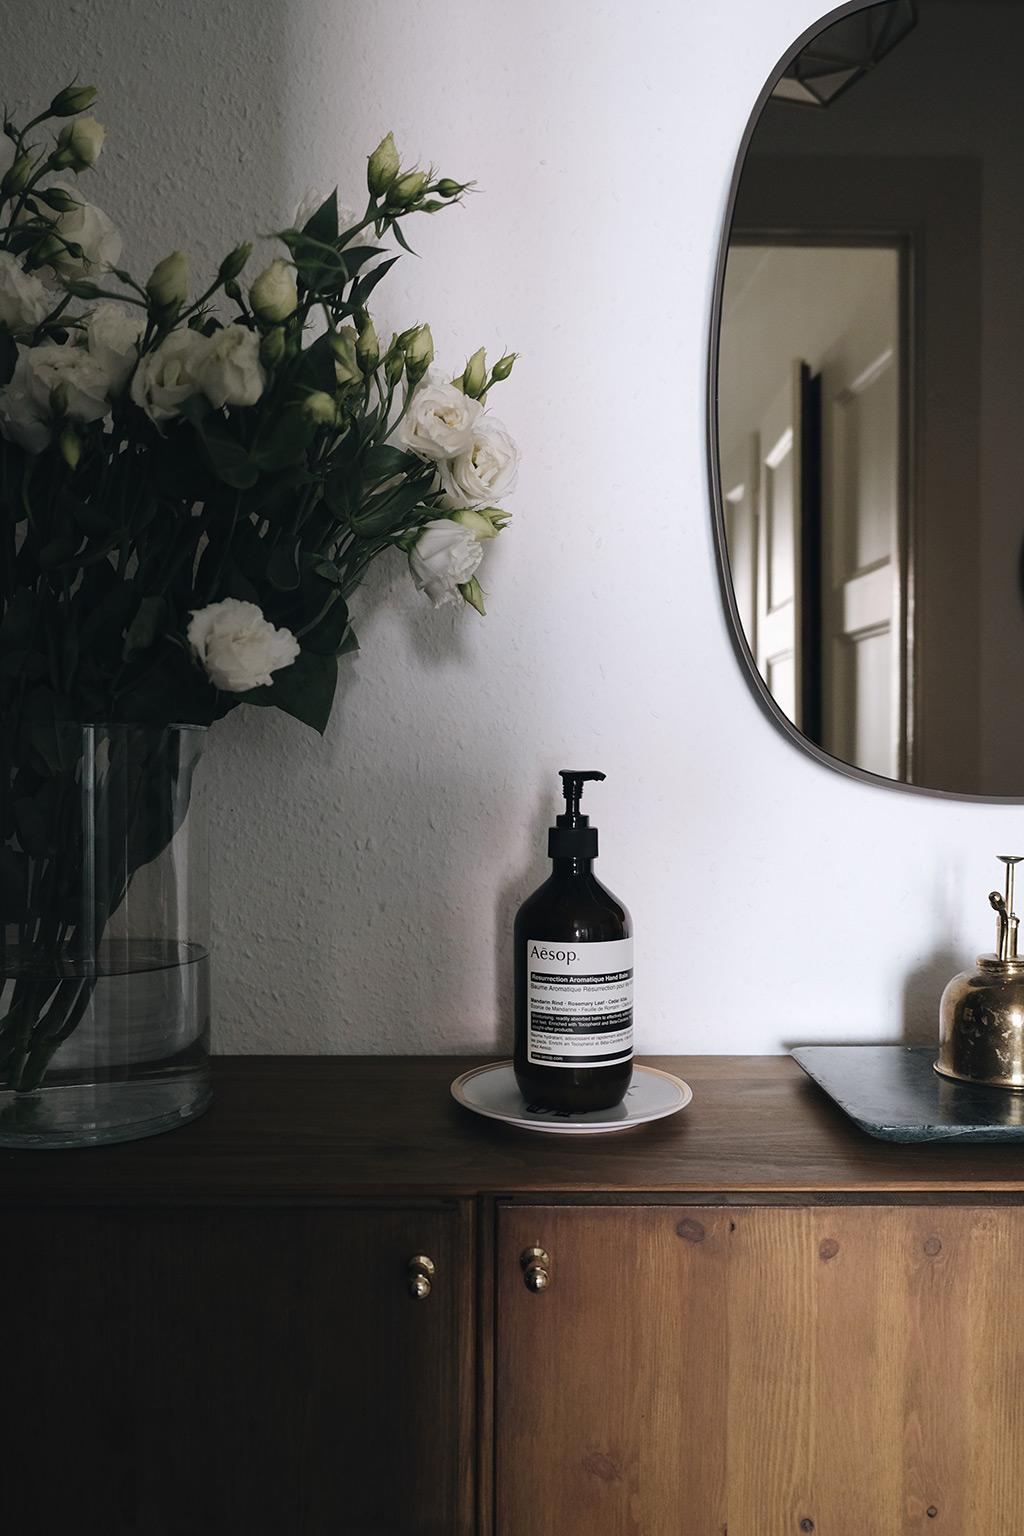 staining ikea ivar cabinets - detail aesop hand cream